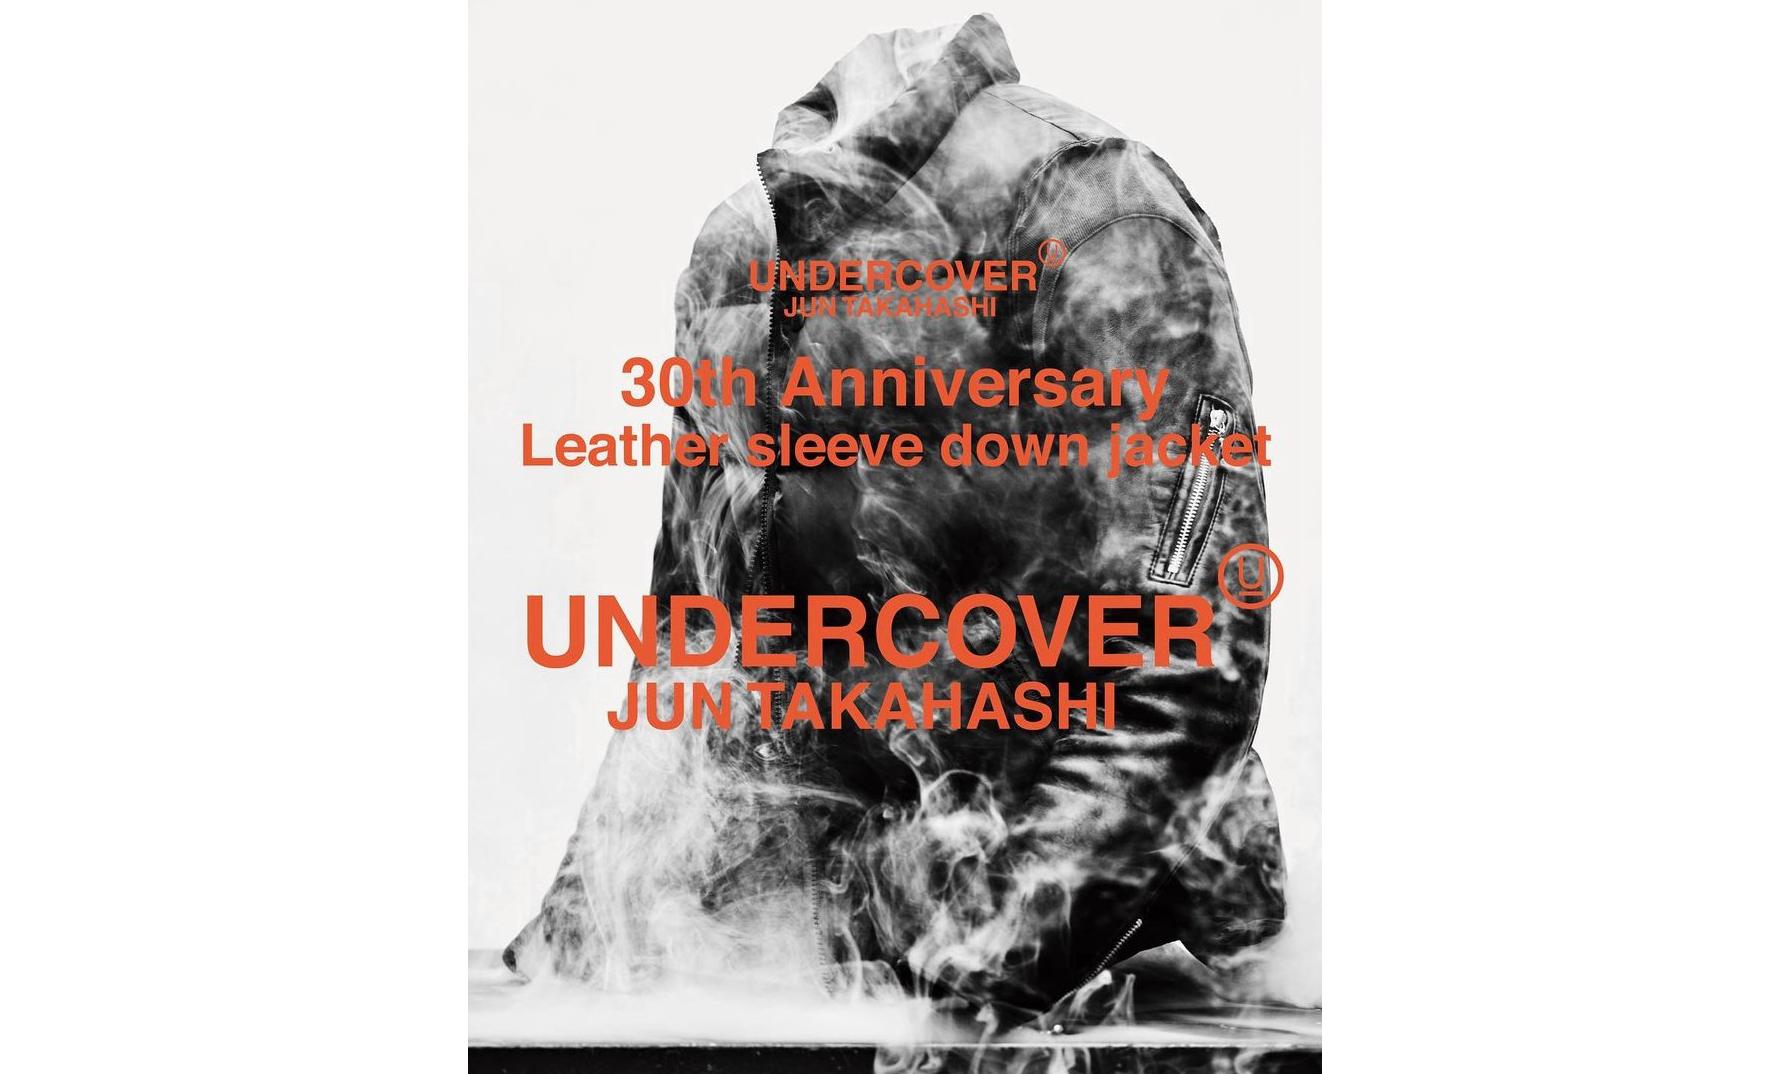 UNDERCOVER 发布 30 周年重磅联乘企划